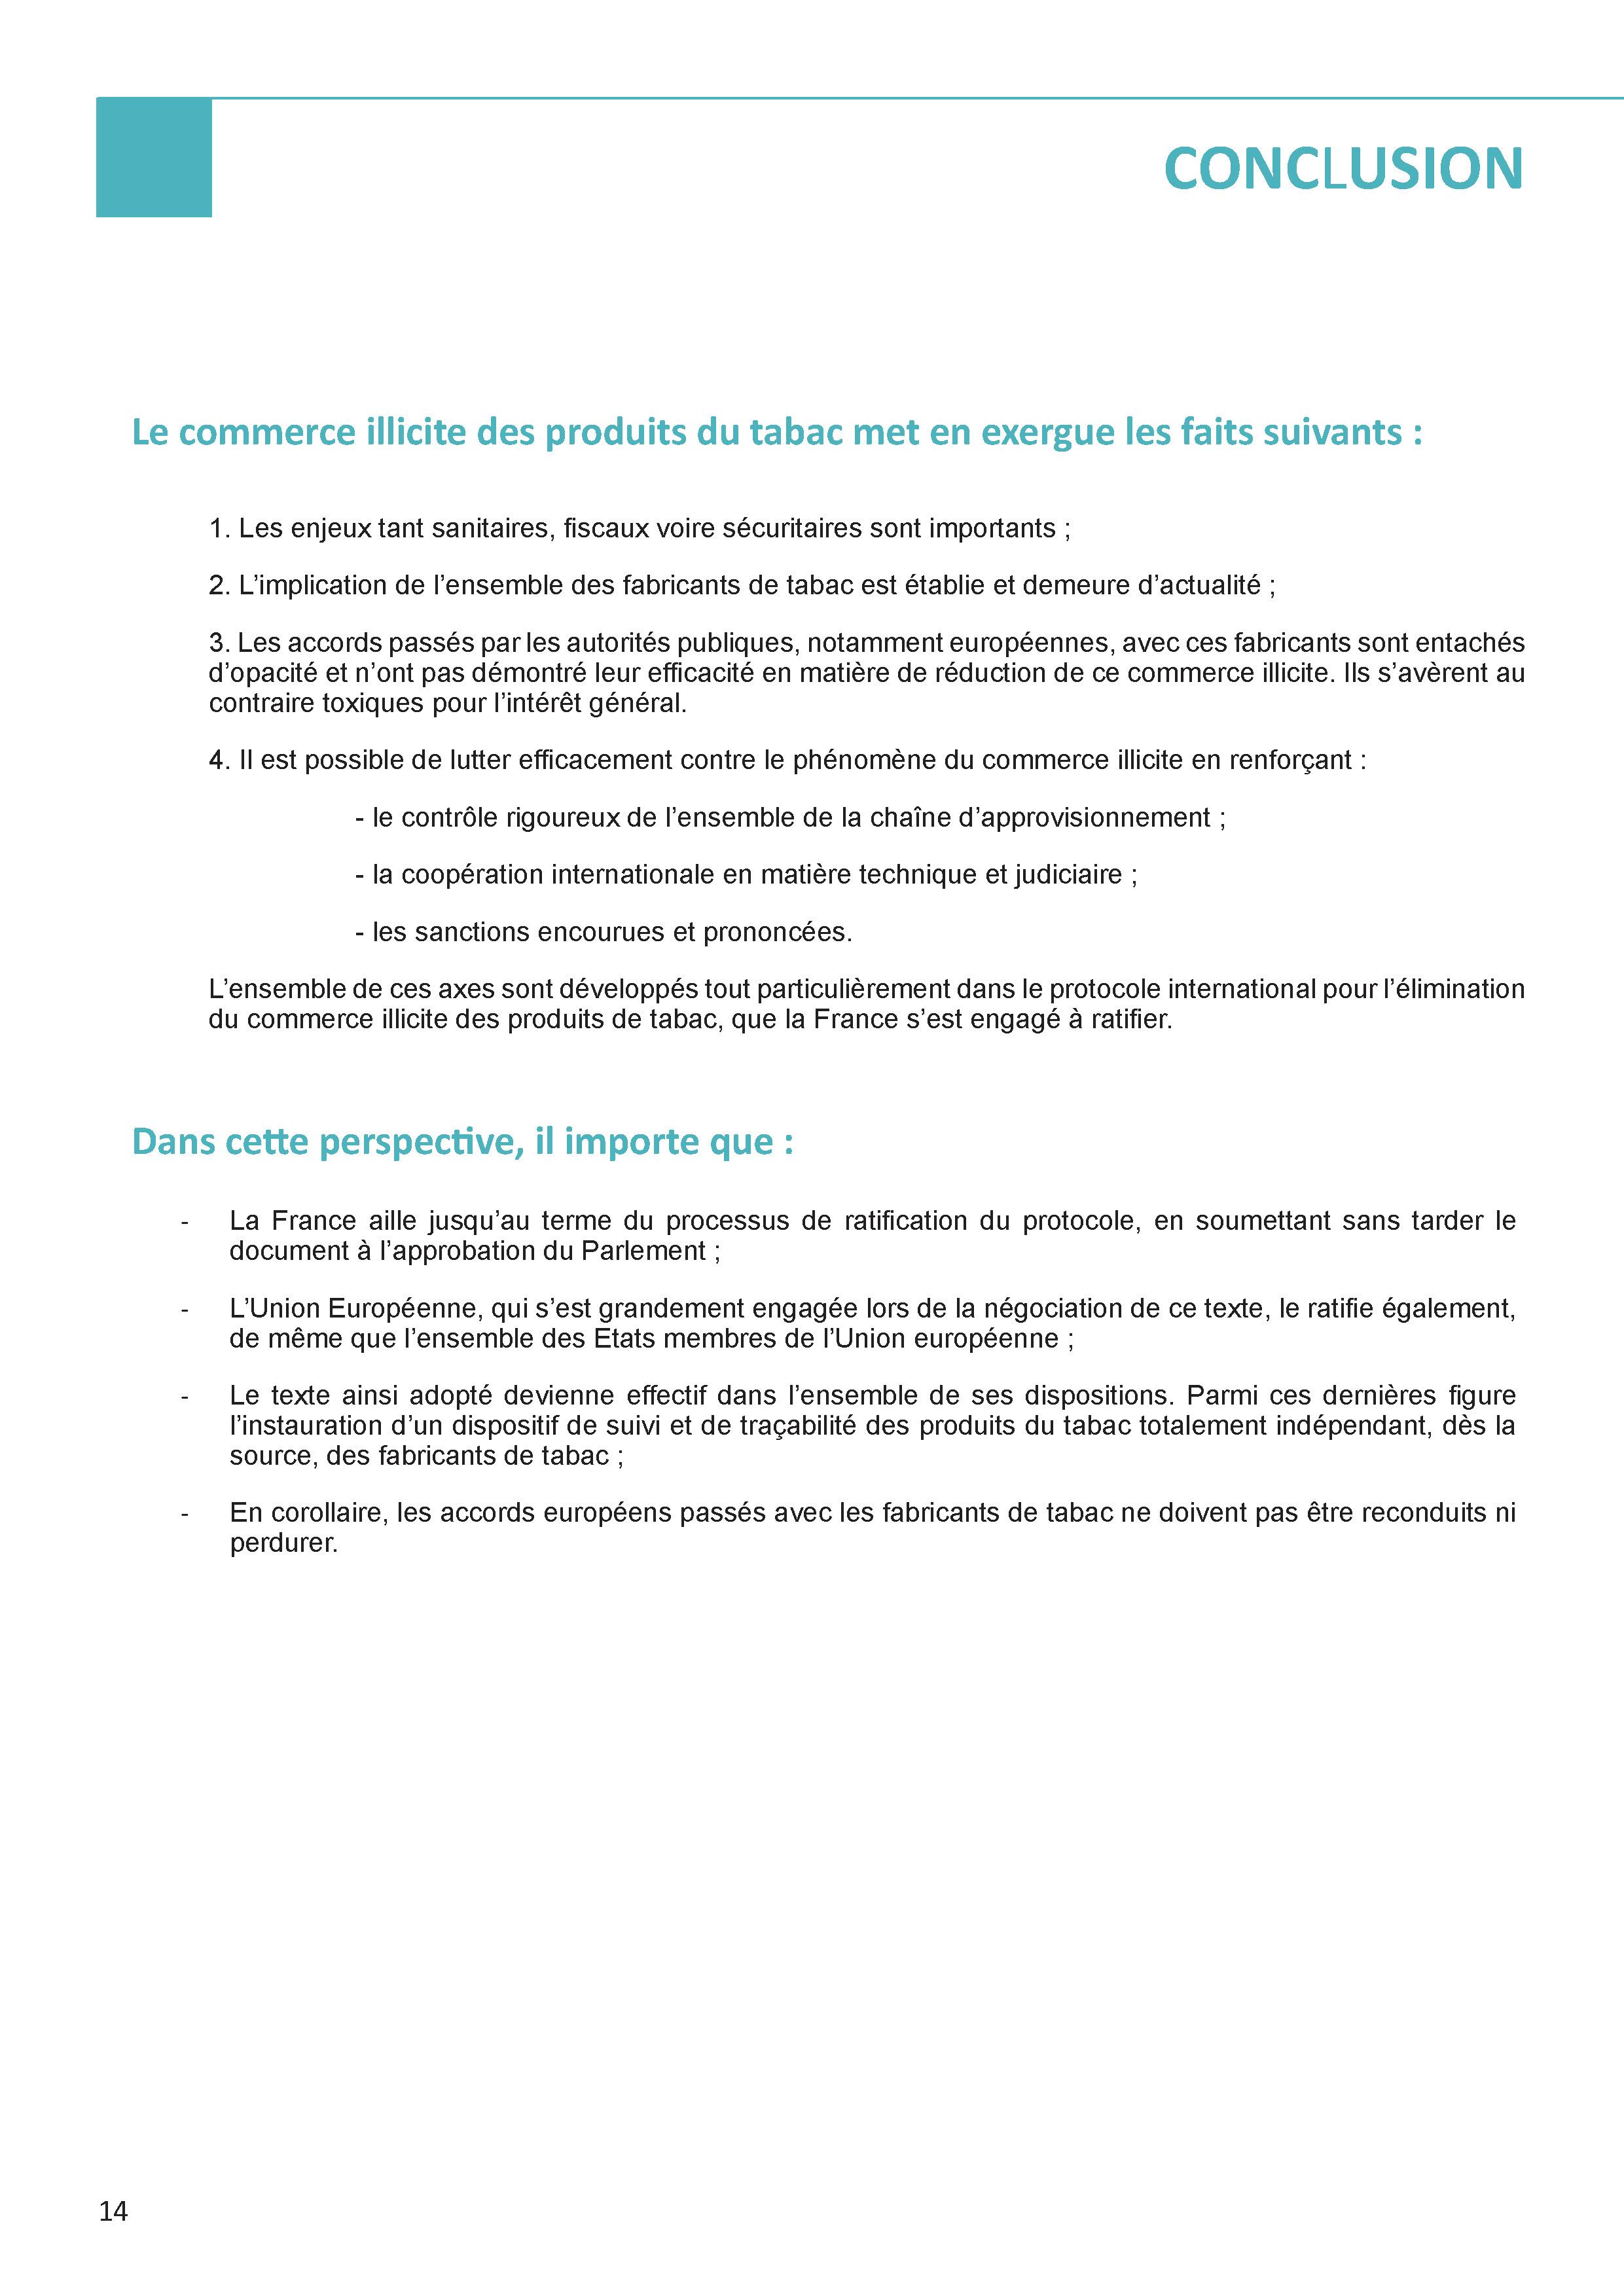 Alliance-DP_commerce-illicite-26mai2015_Page_14.jpg